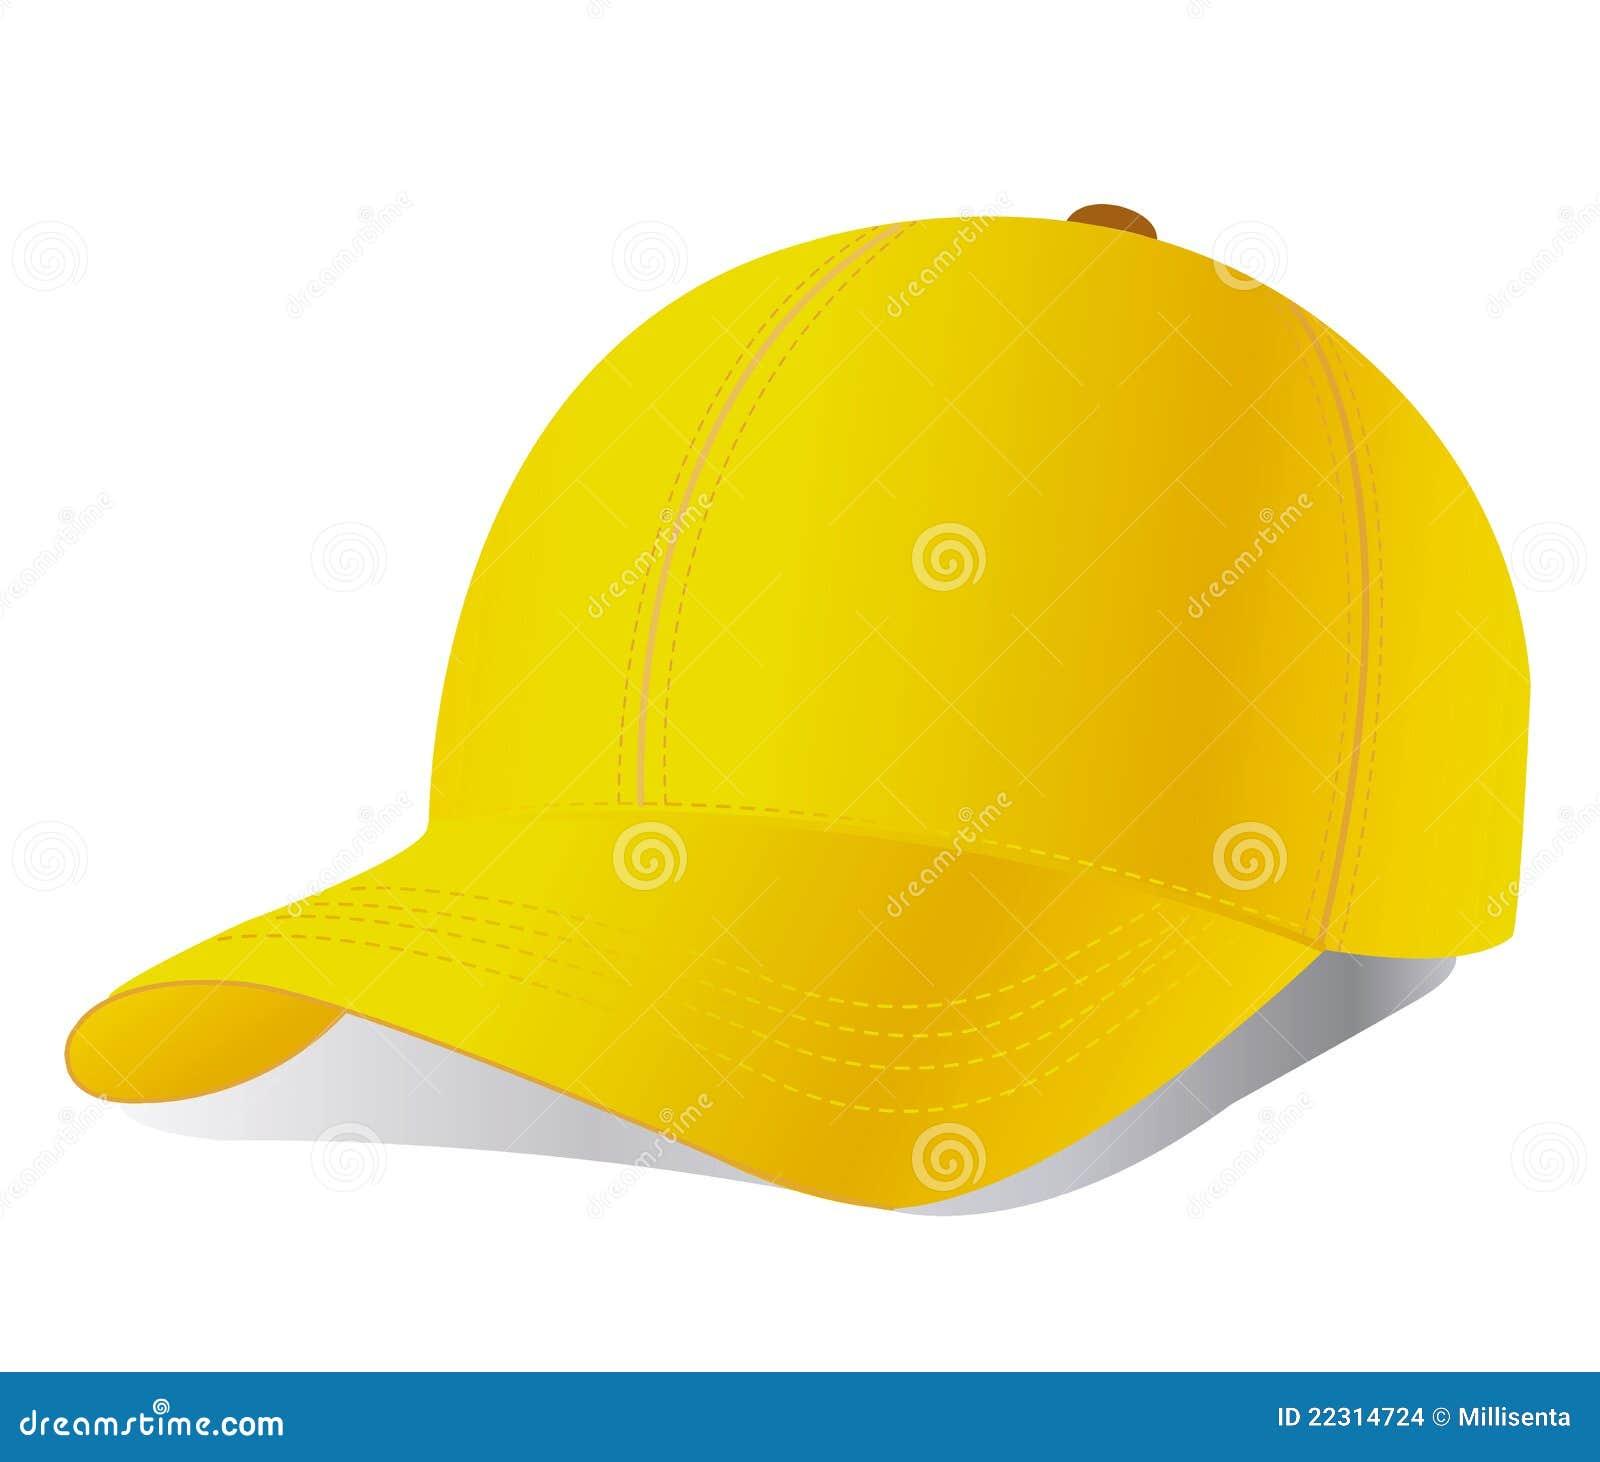 vector yellow baseball cap stock images image 22314724 fashion man clipart fashion man clipart